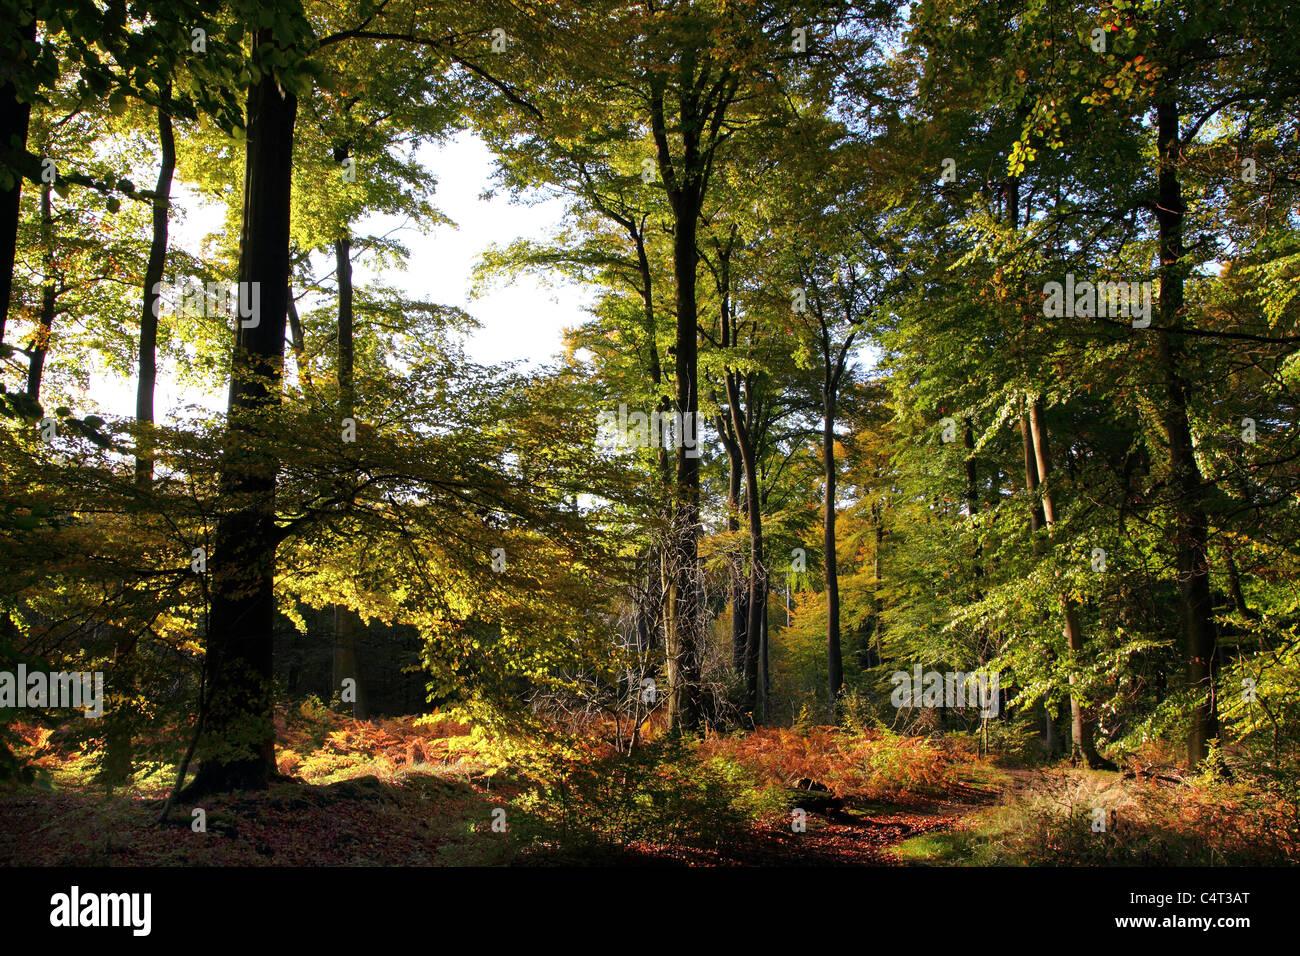 Forest, trees, sunshine, summer, perfect idyll. - Stock Image